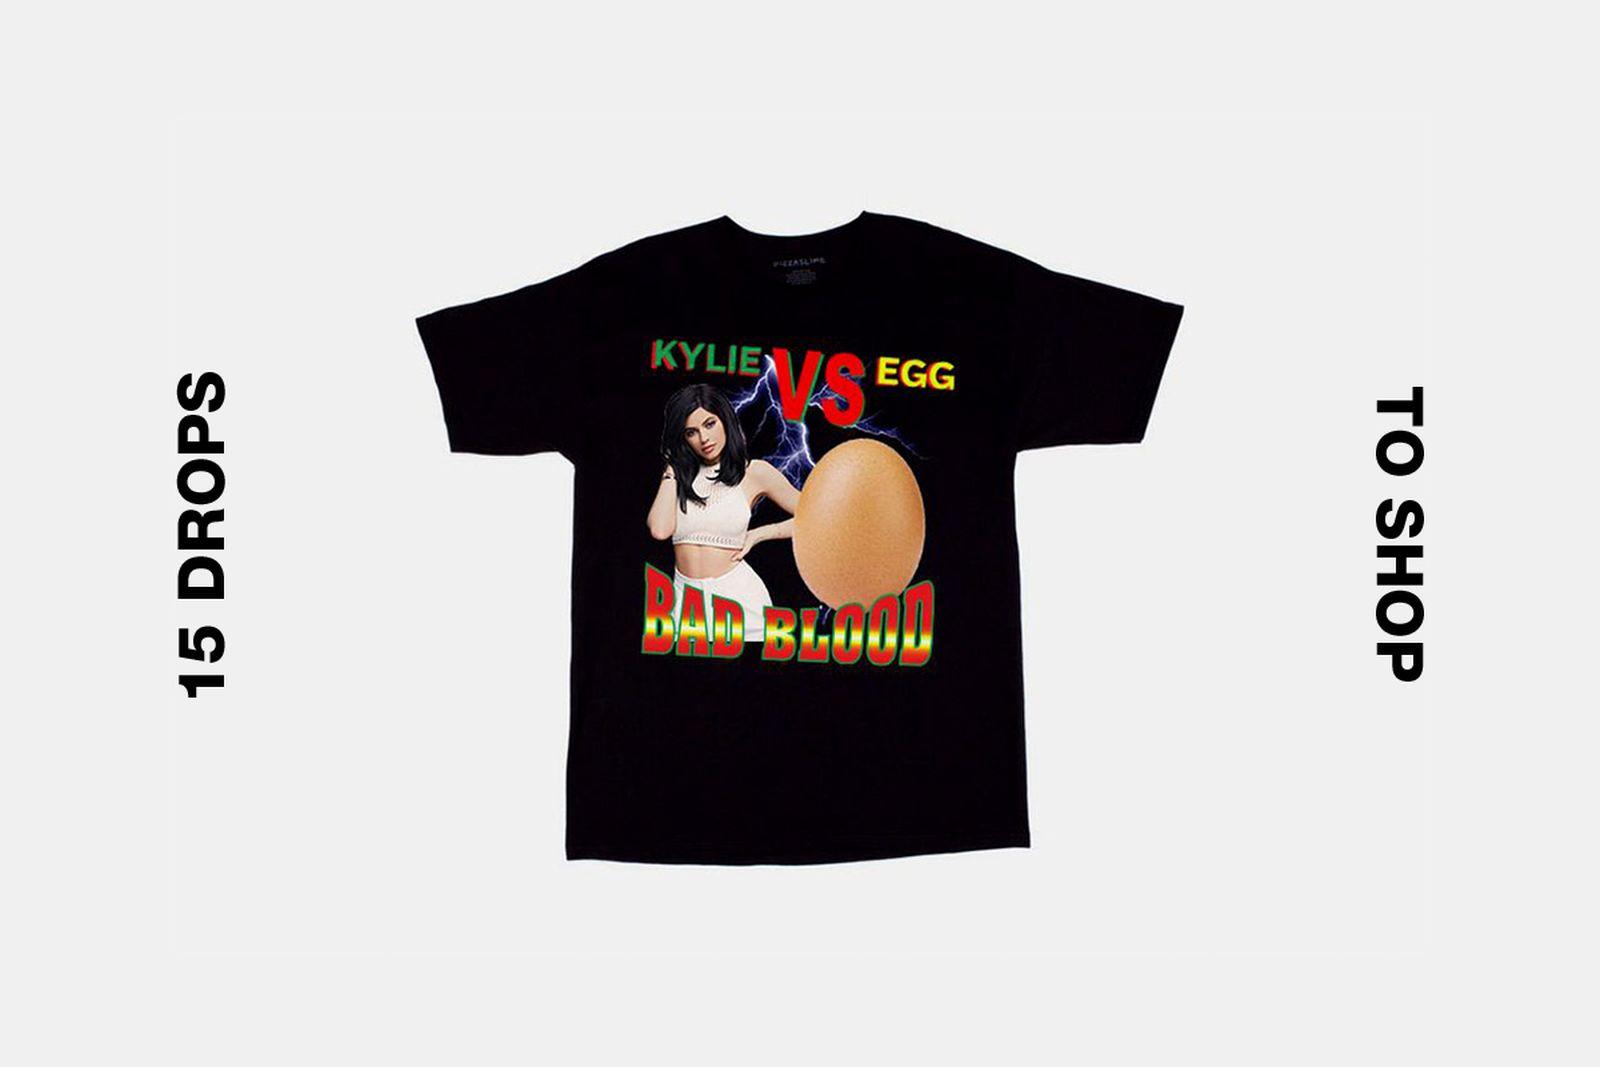 pizzaslime kylie egg t shirt best drops buy Air Jordan Converse Fendi